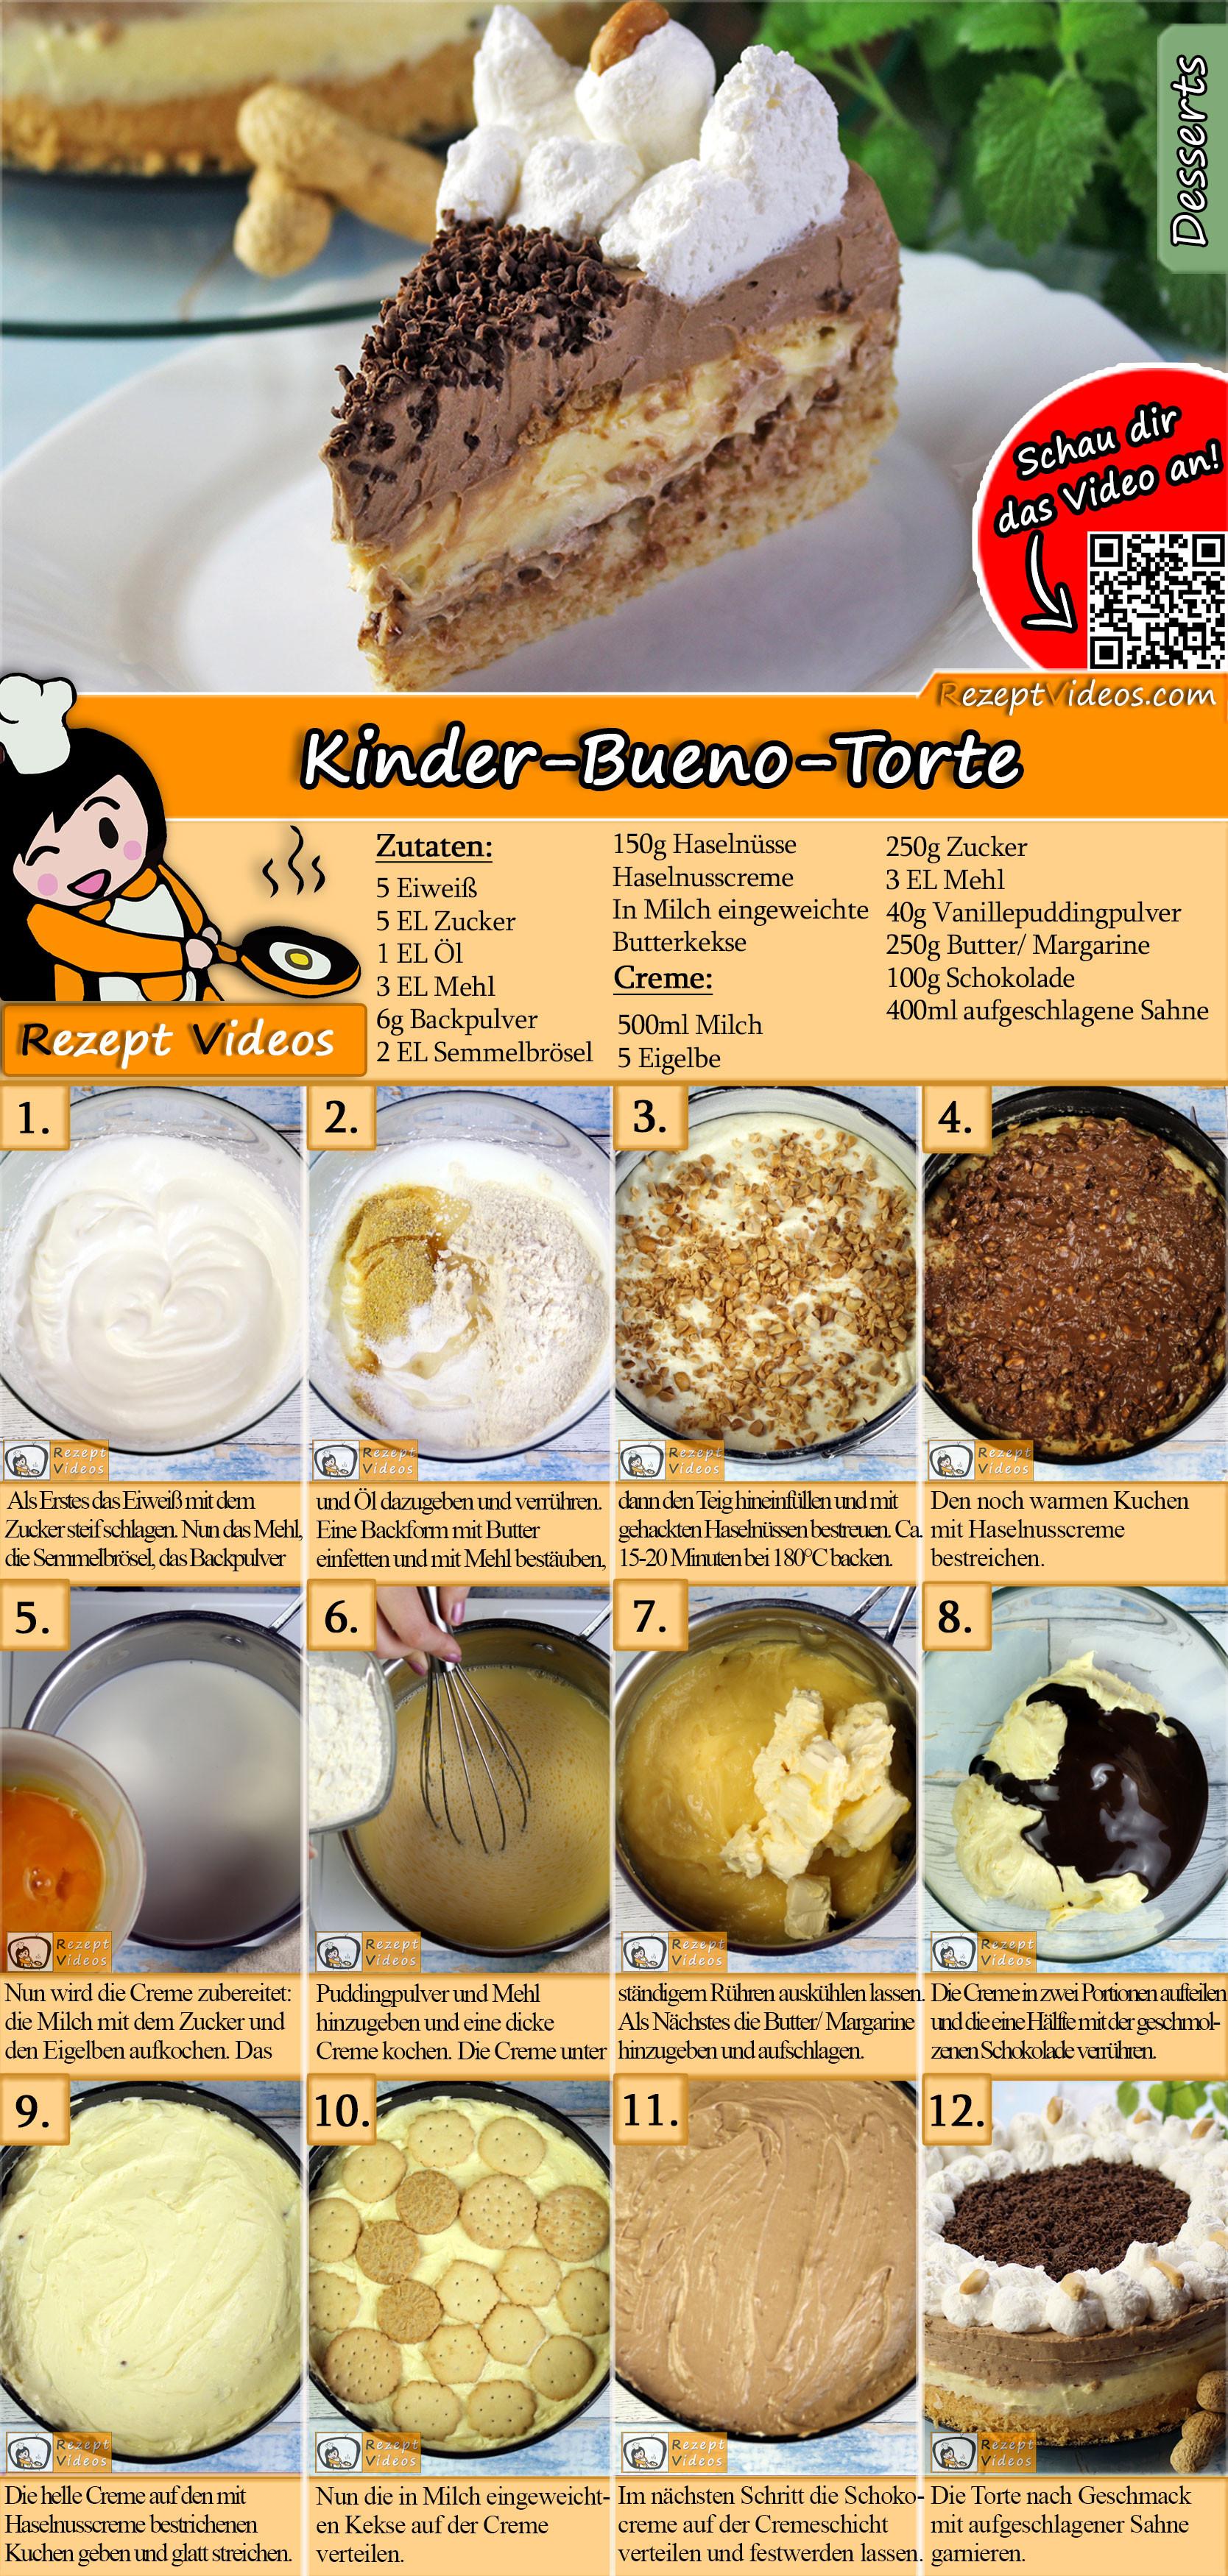 Kinder-Bueno-Torte Rezept mit Video